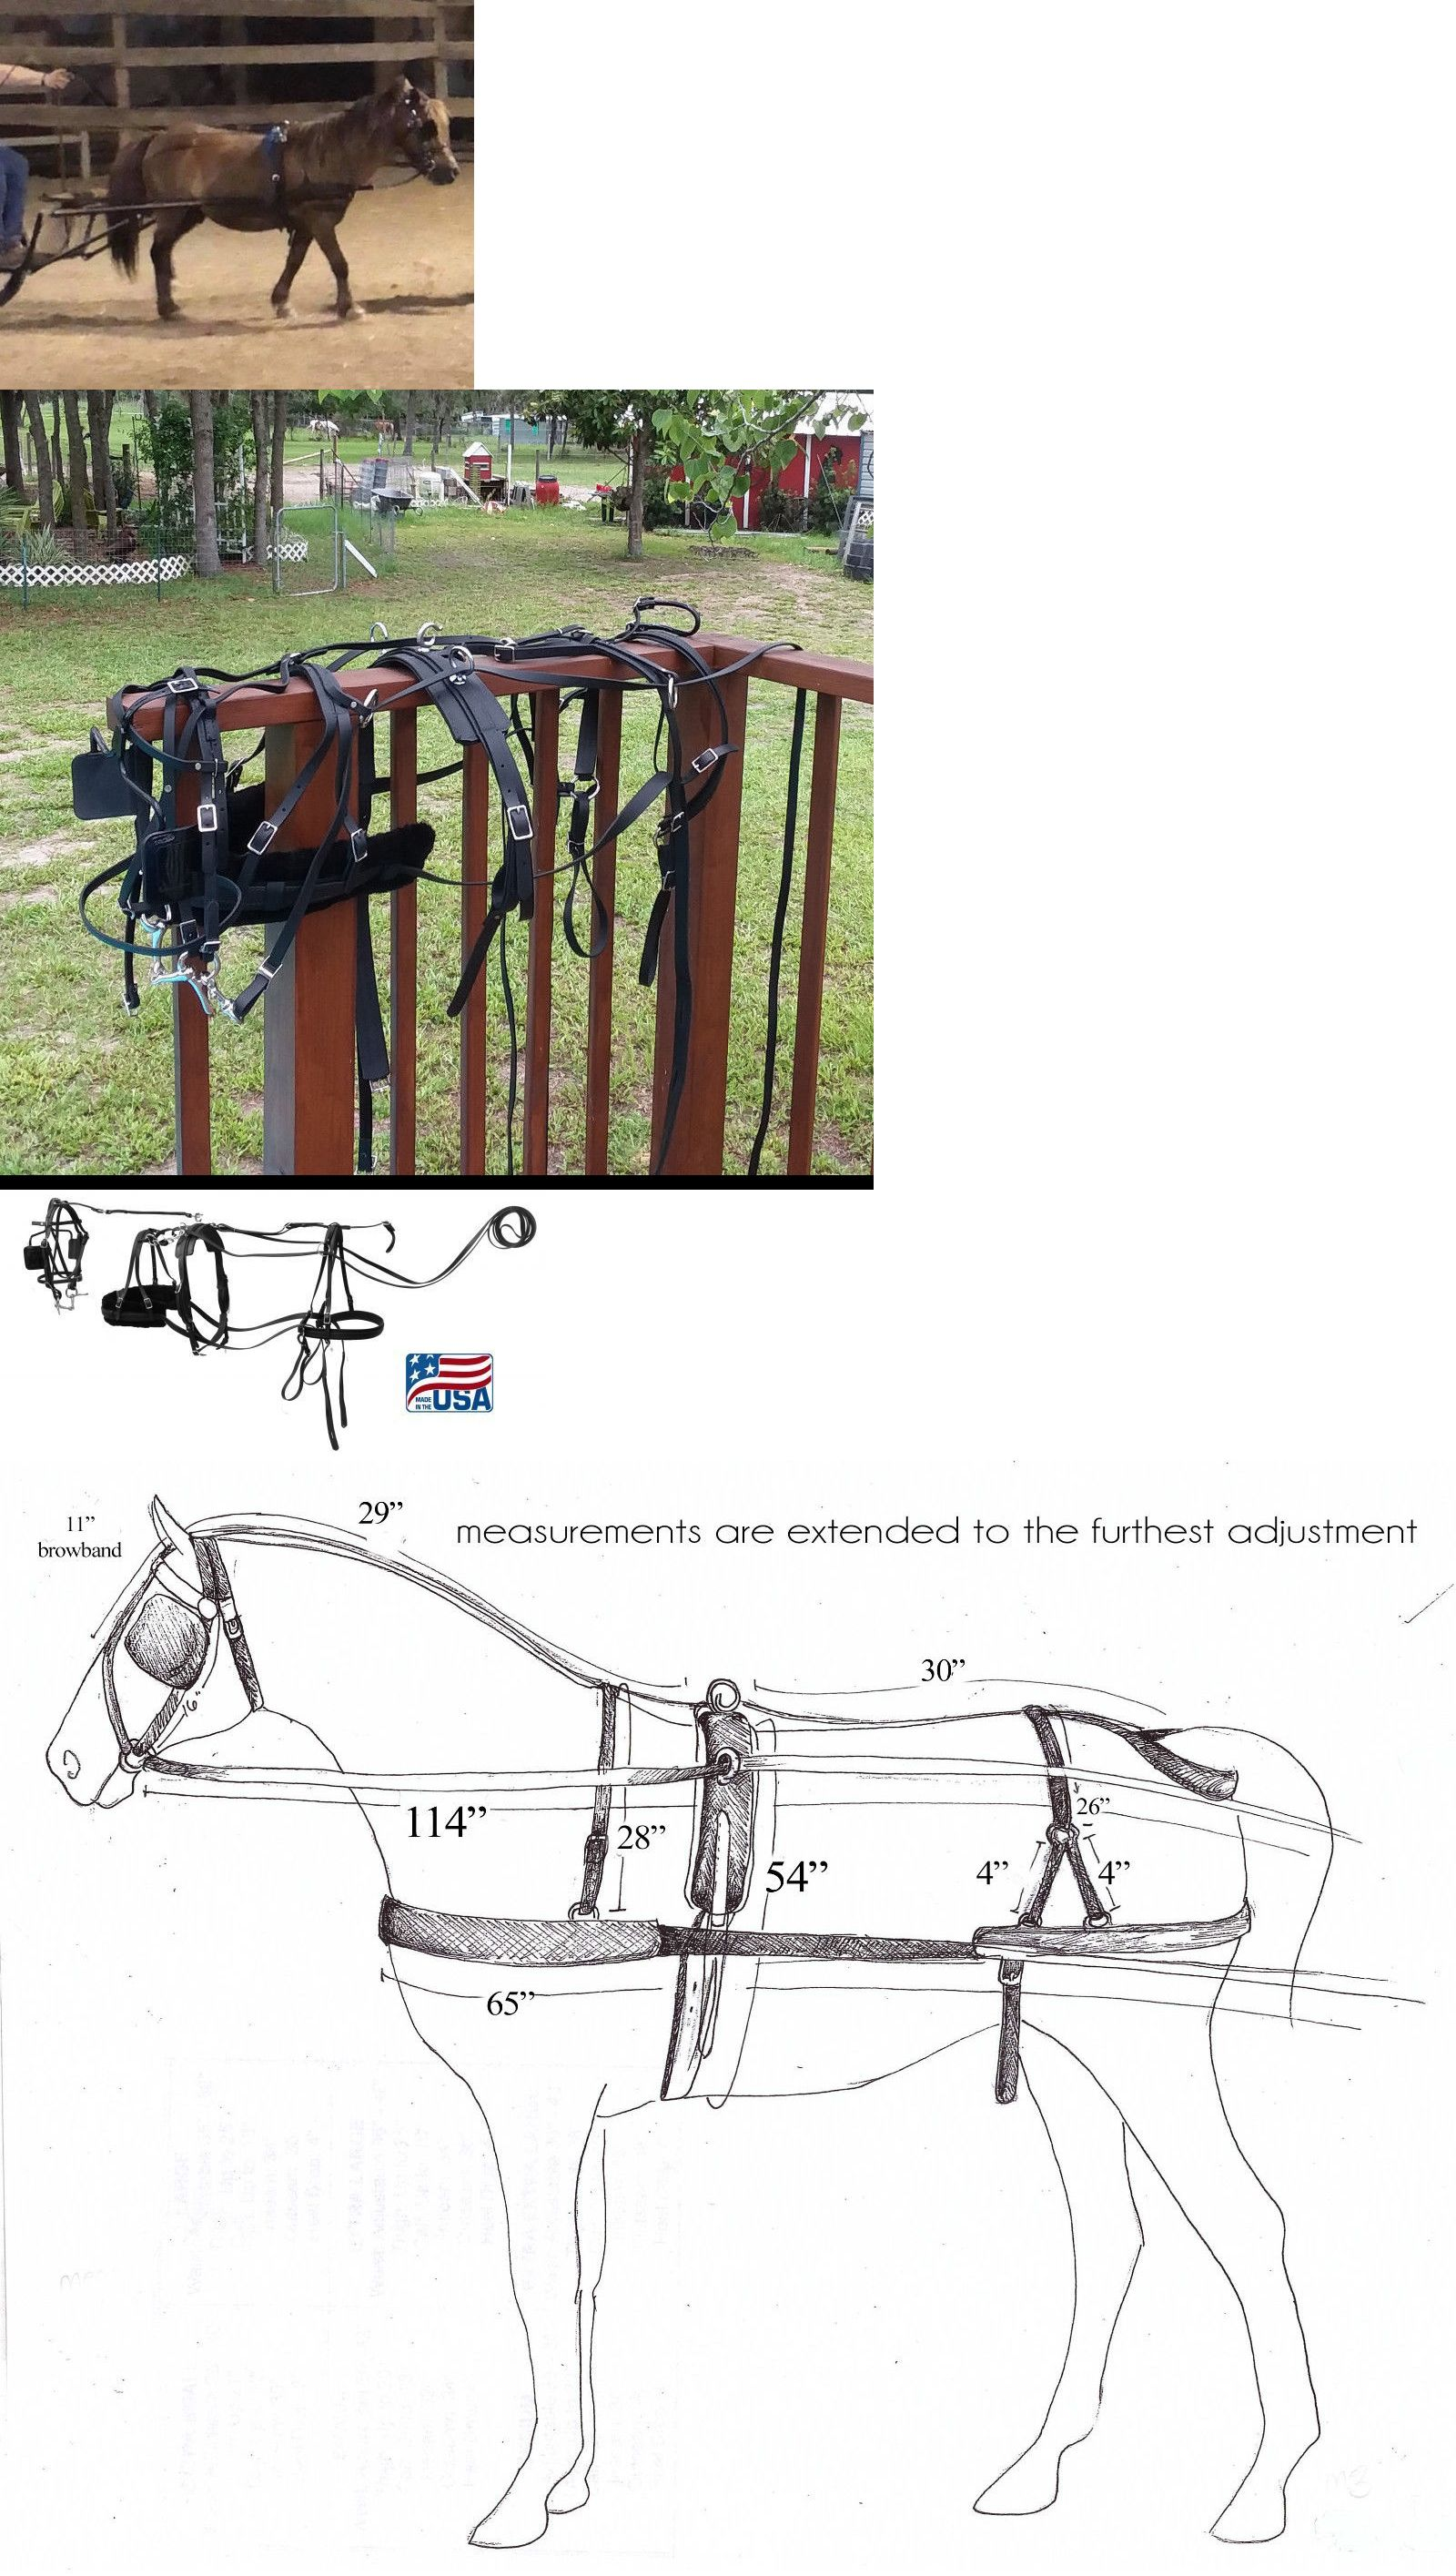 medium resolution of driving equipment 85178 qualtiy synthetic biothane mini miniature horse small pony driving harness usa